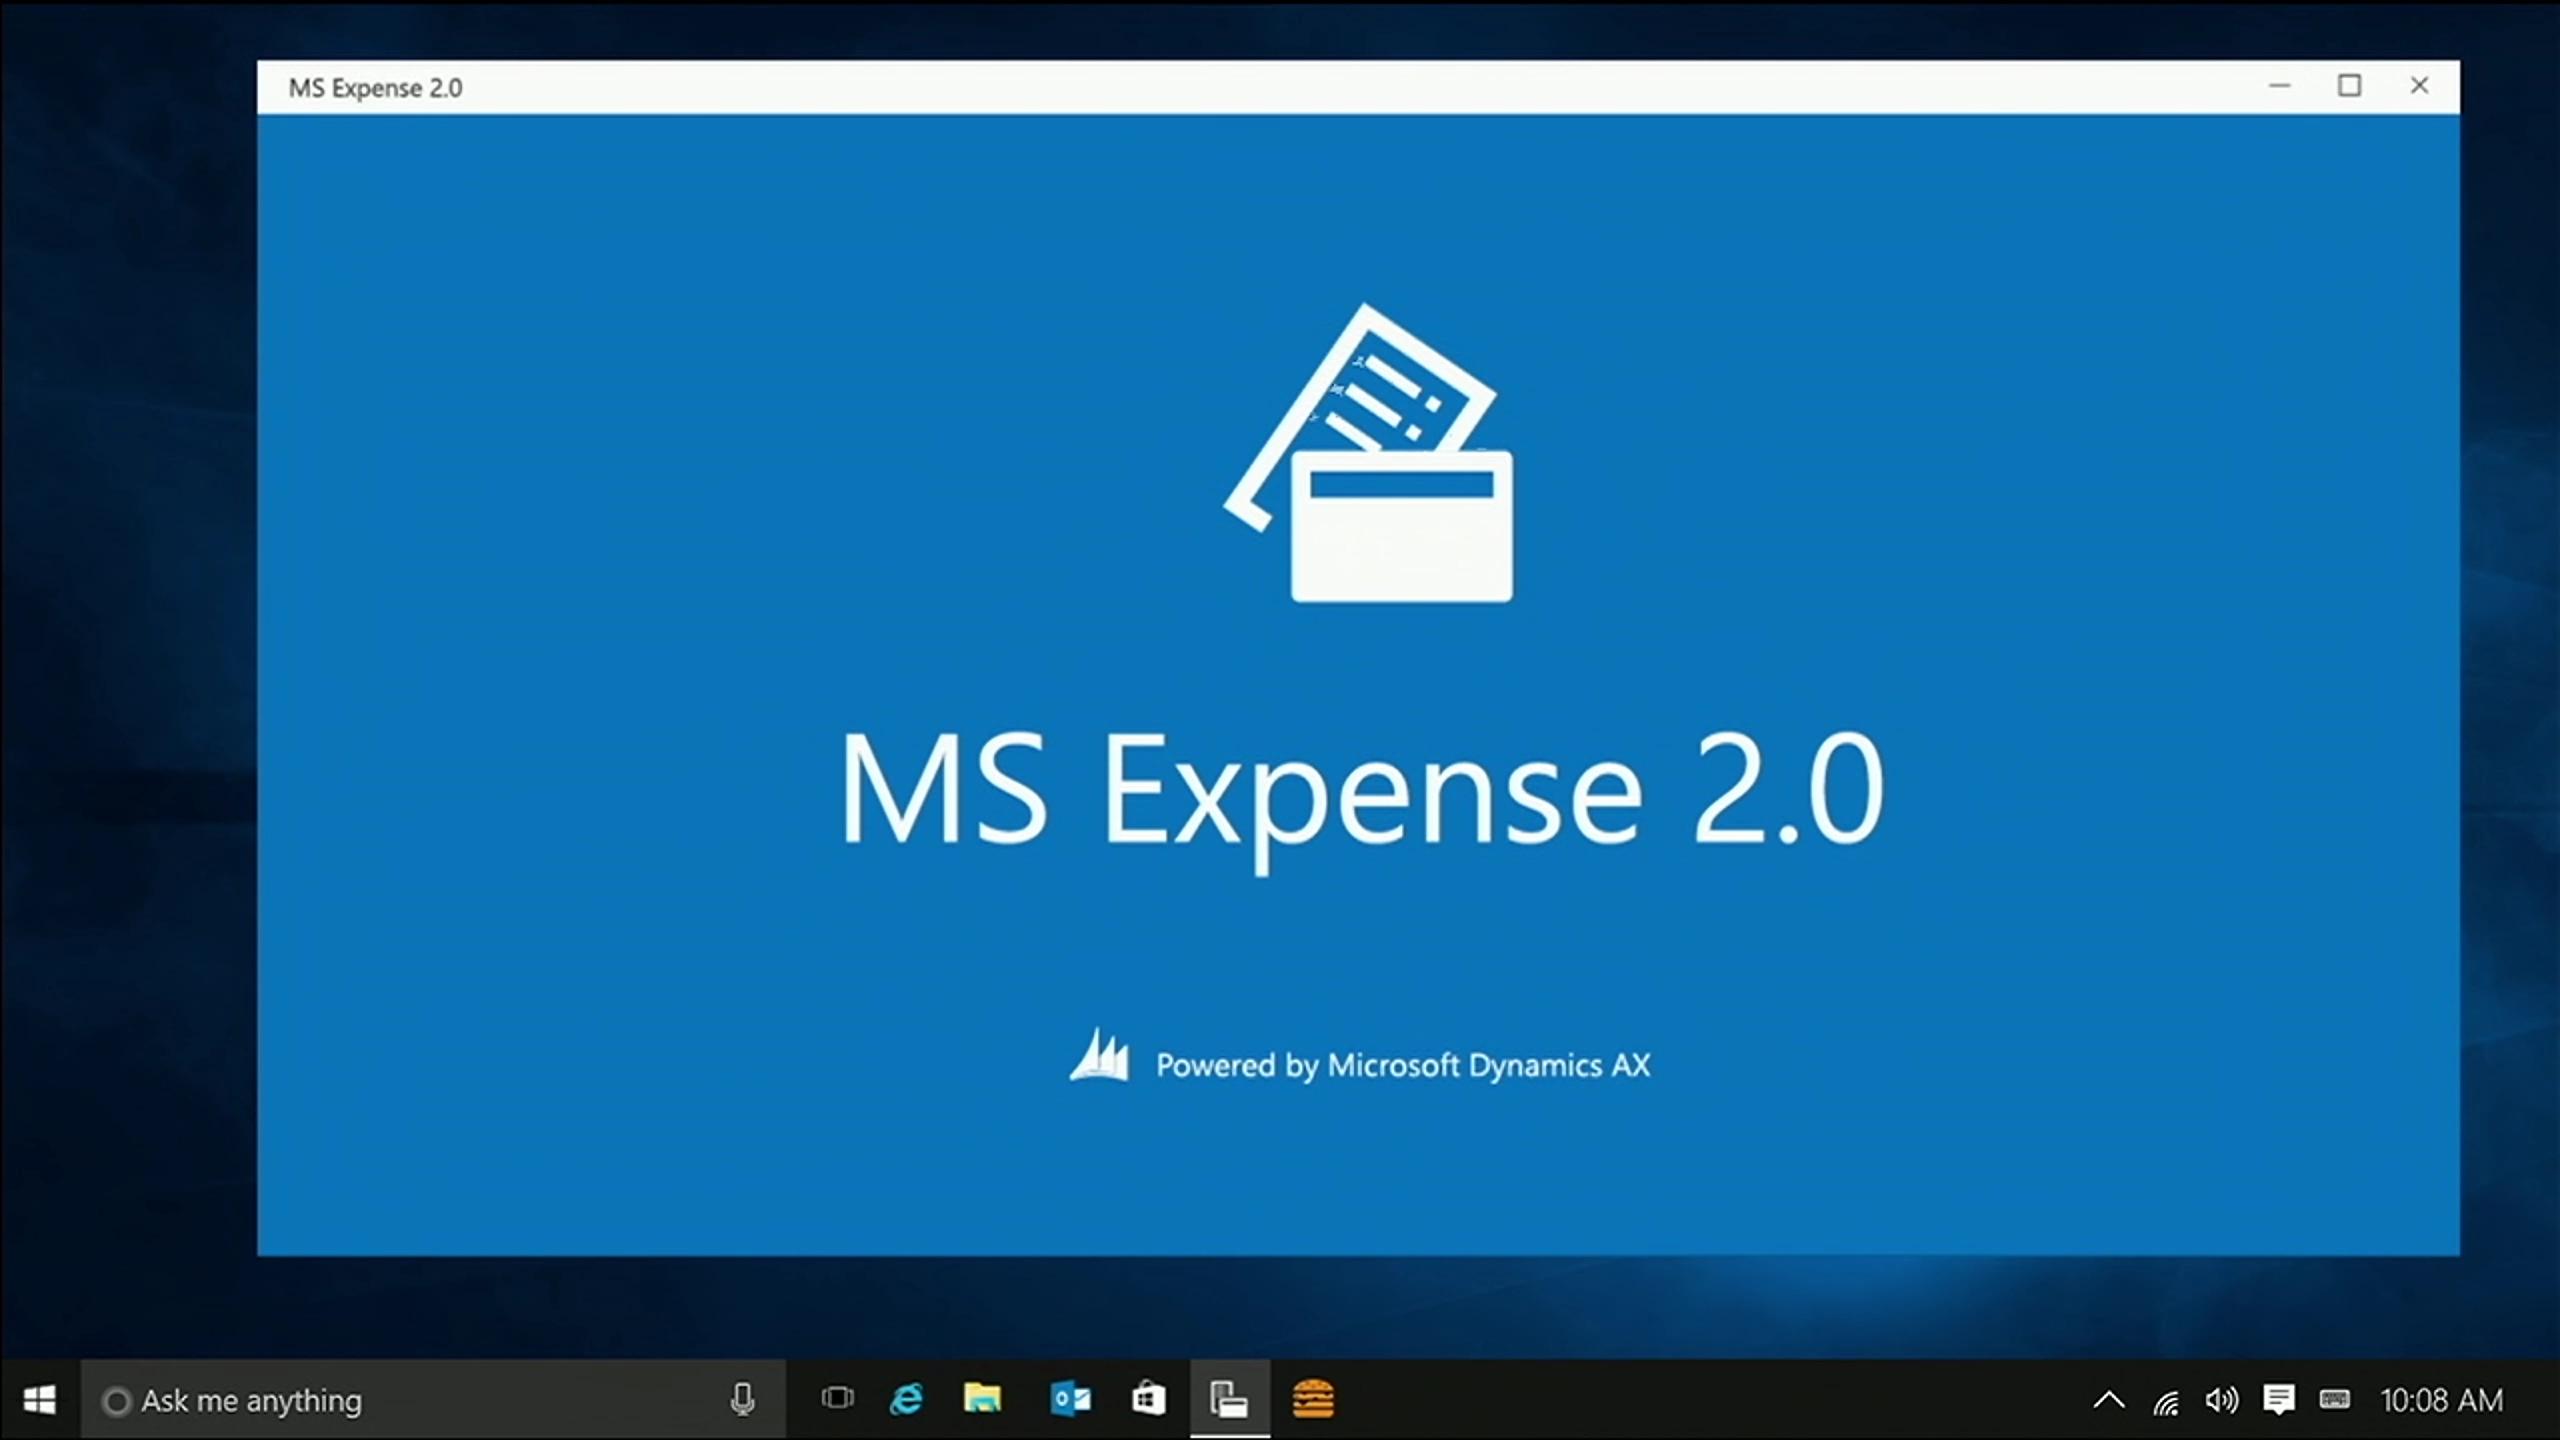 ms expense